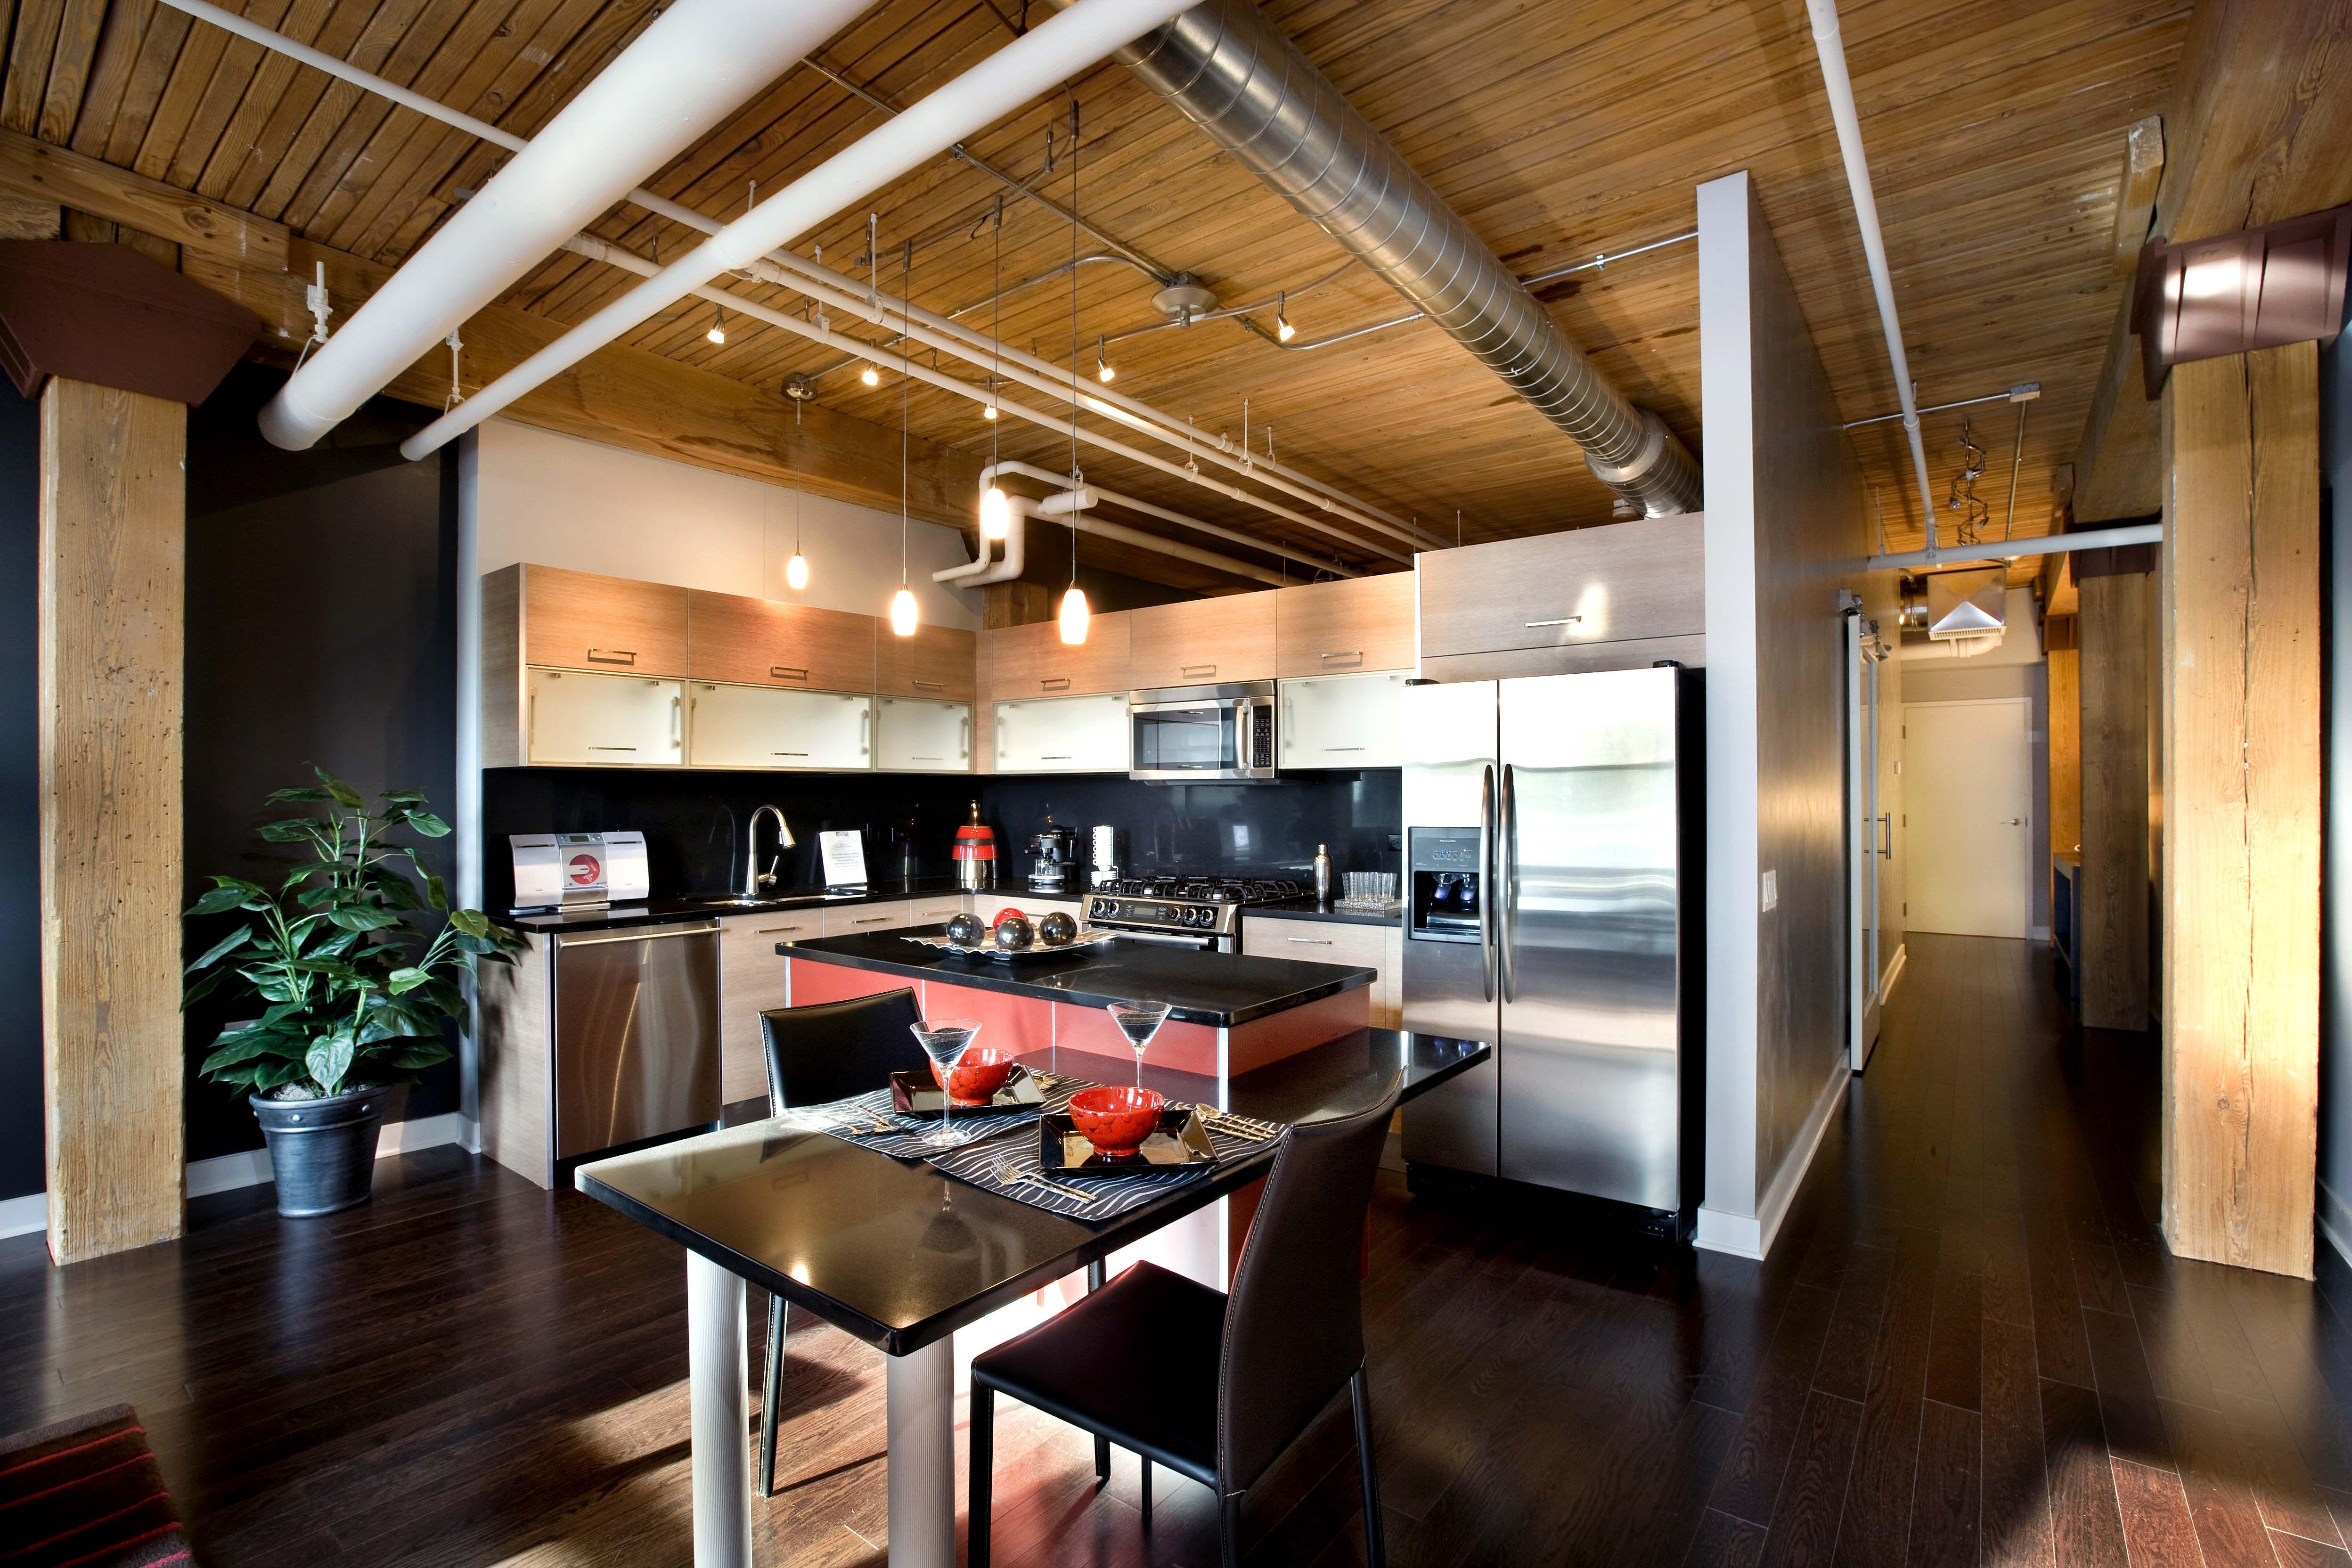 275242.jpg 4,992×3,328 pixels Loft kitchen, Loft living